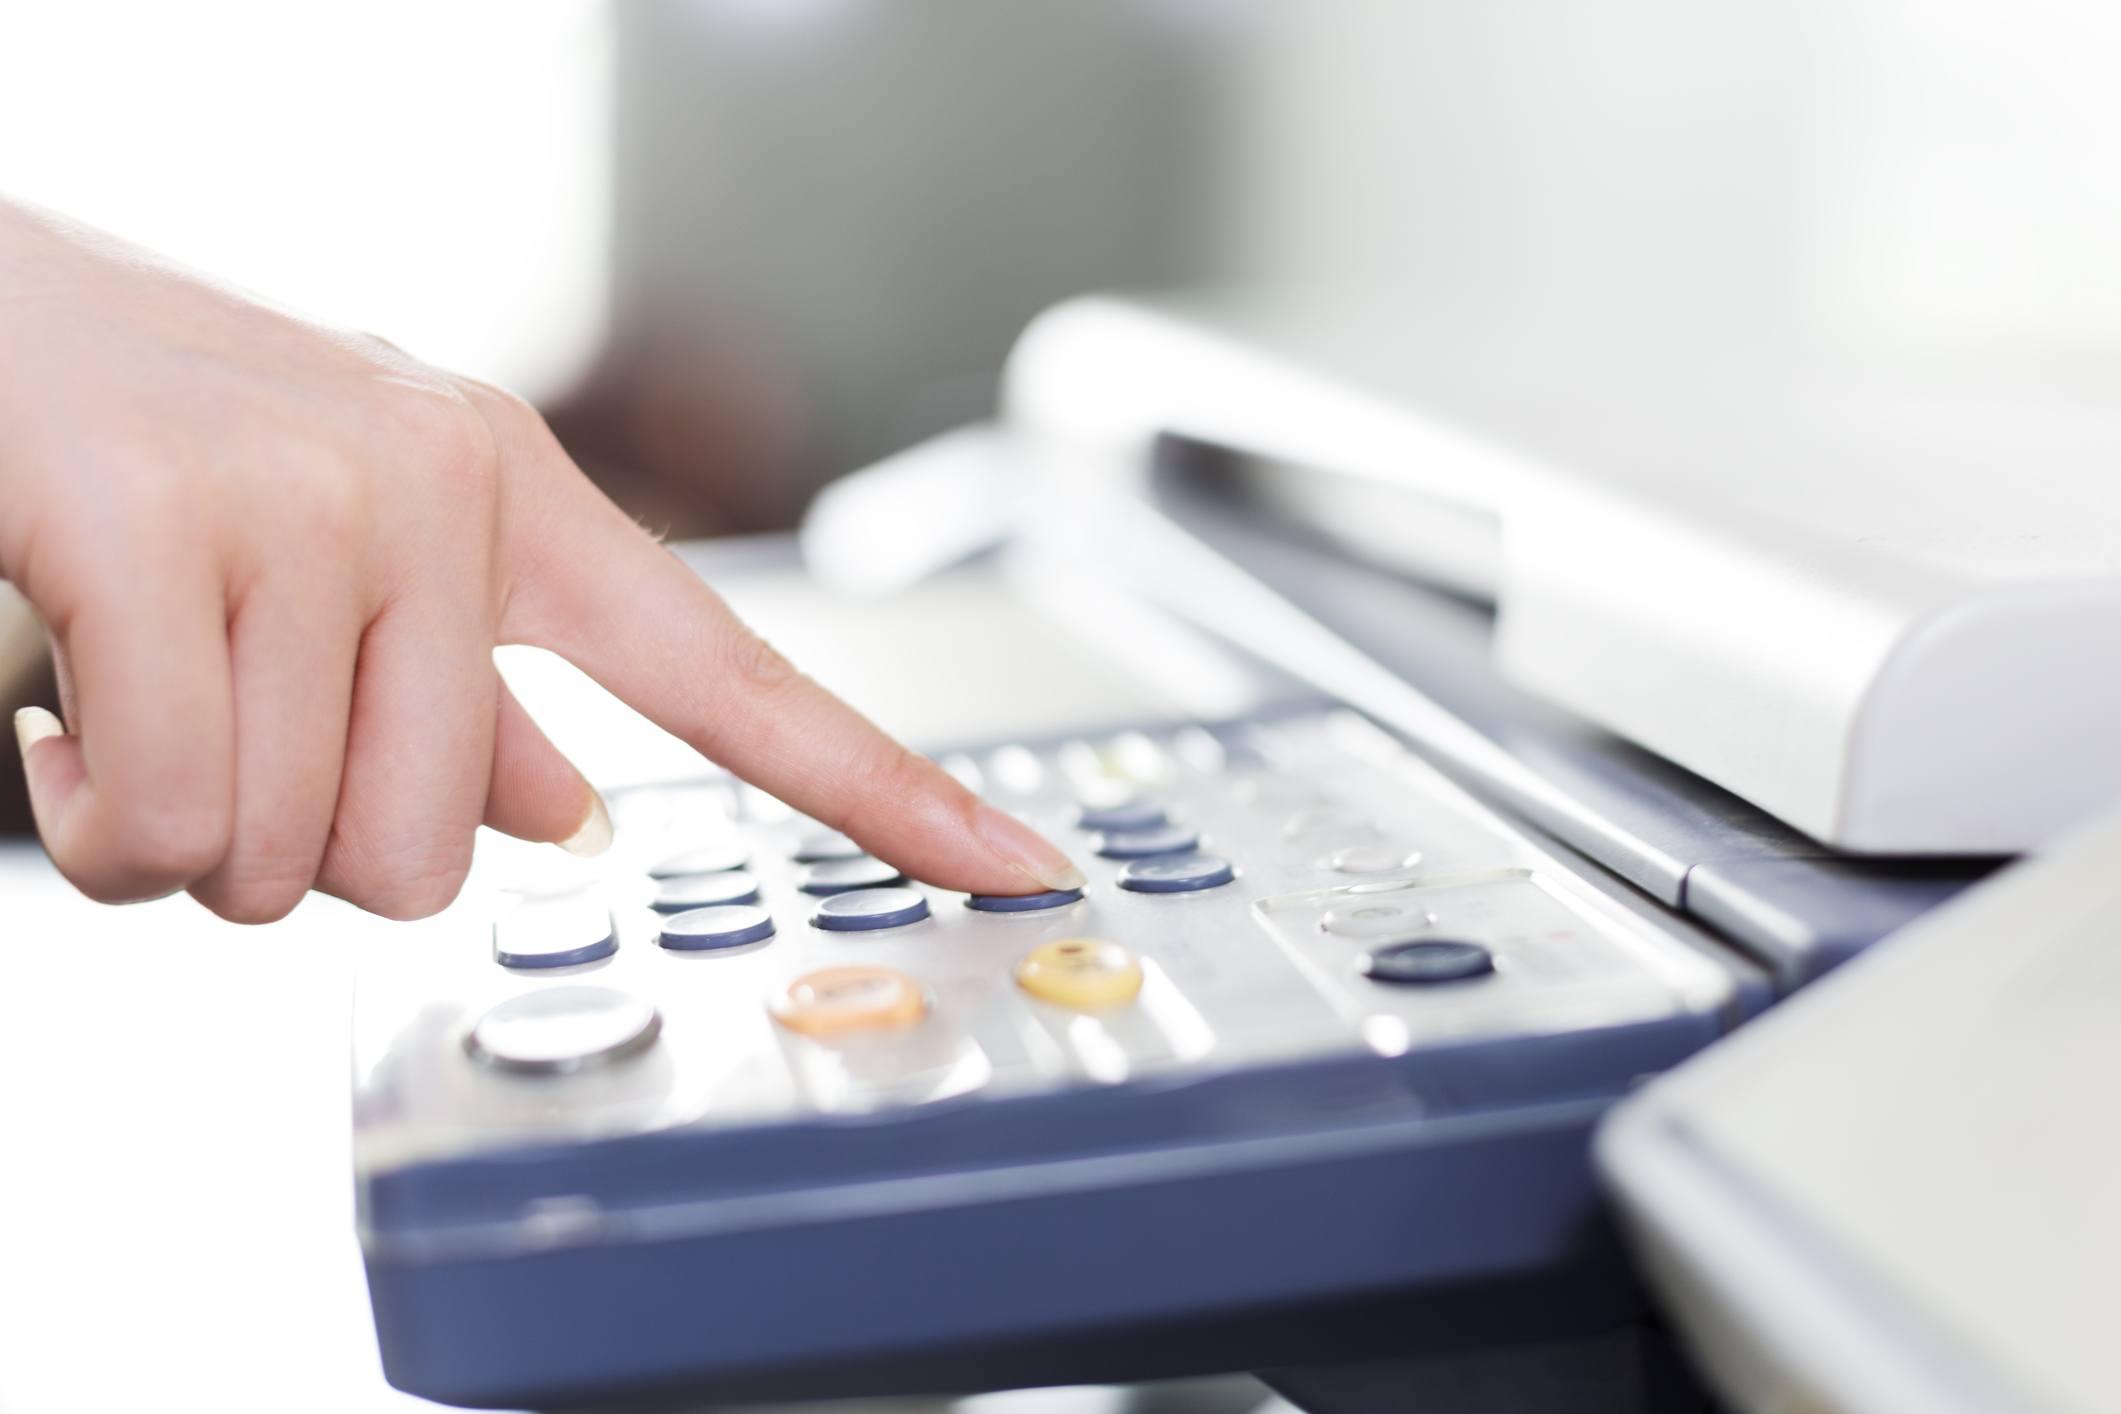 girl's finger presses button of copier